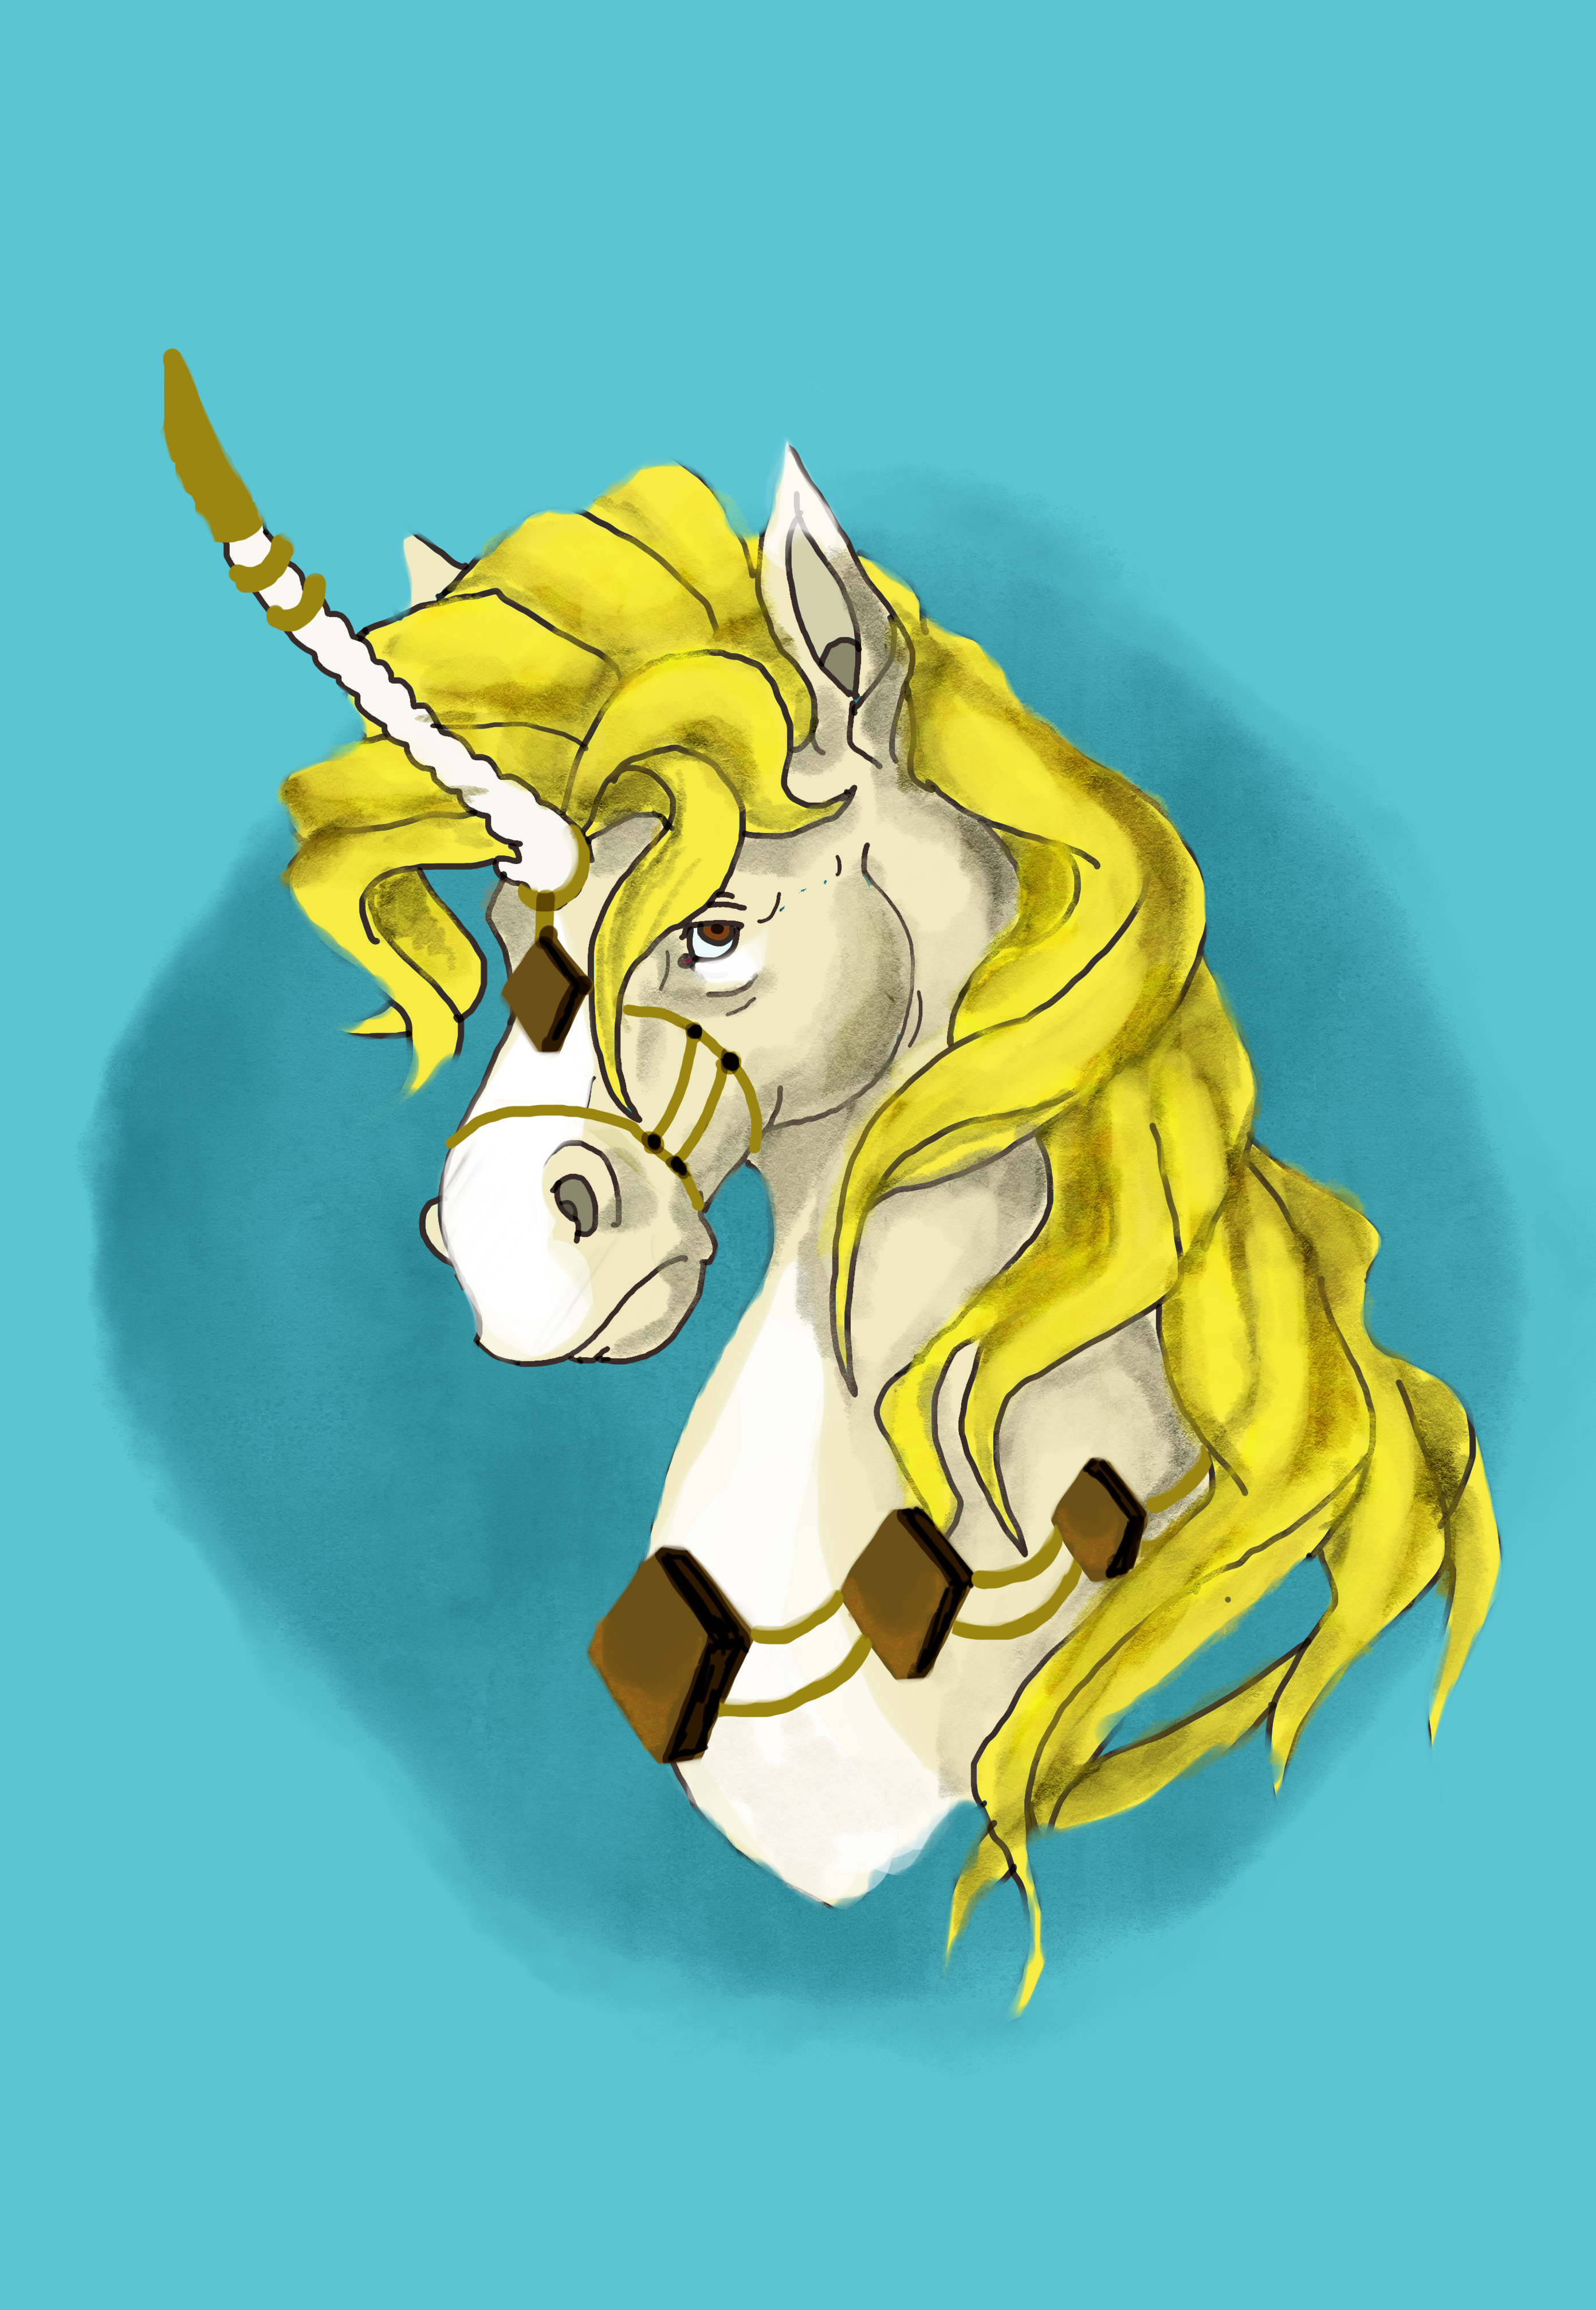 Finnegan the Royal Unicorn